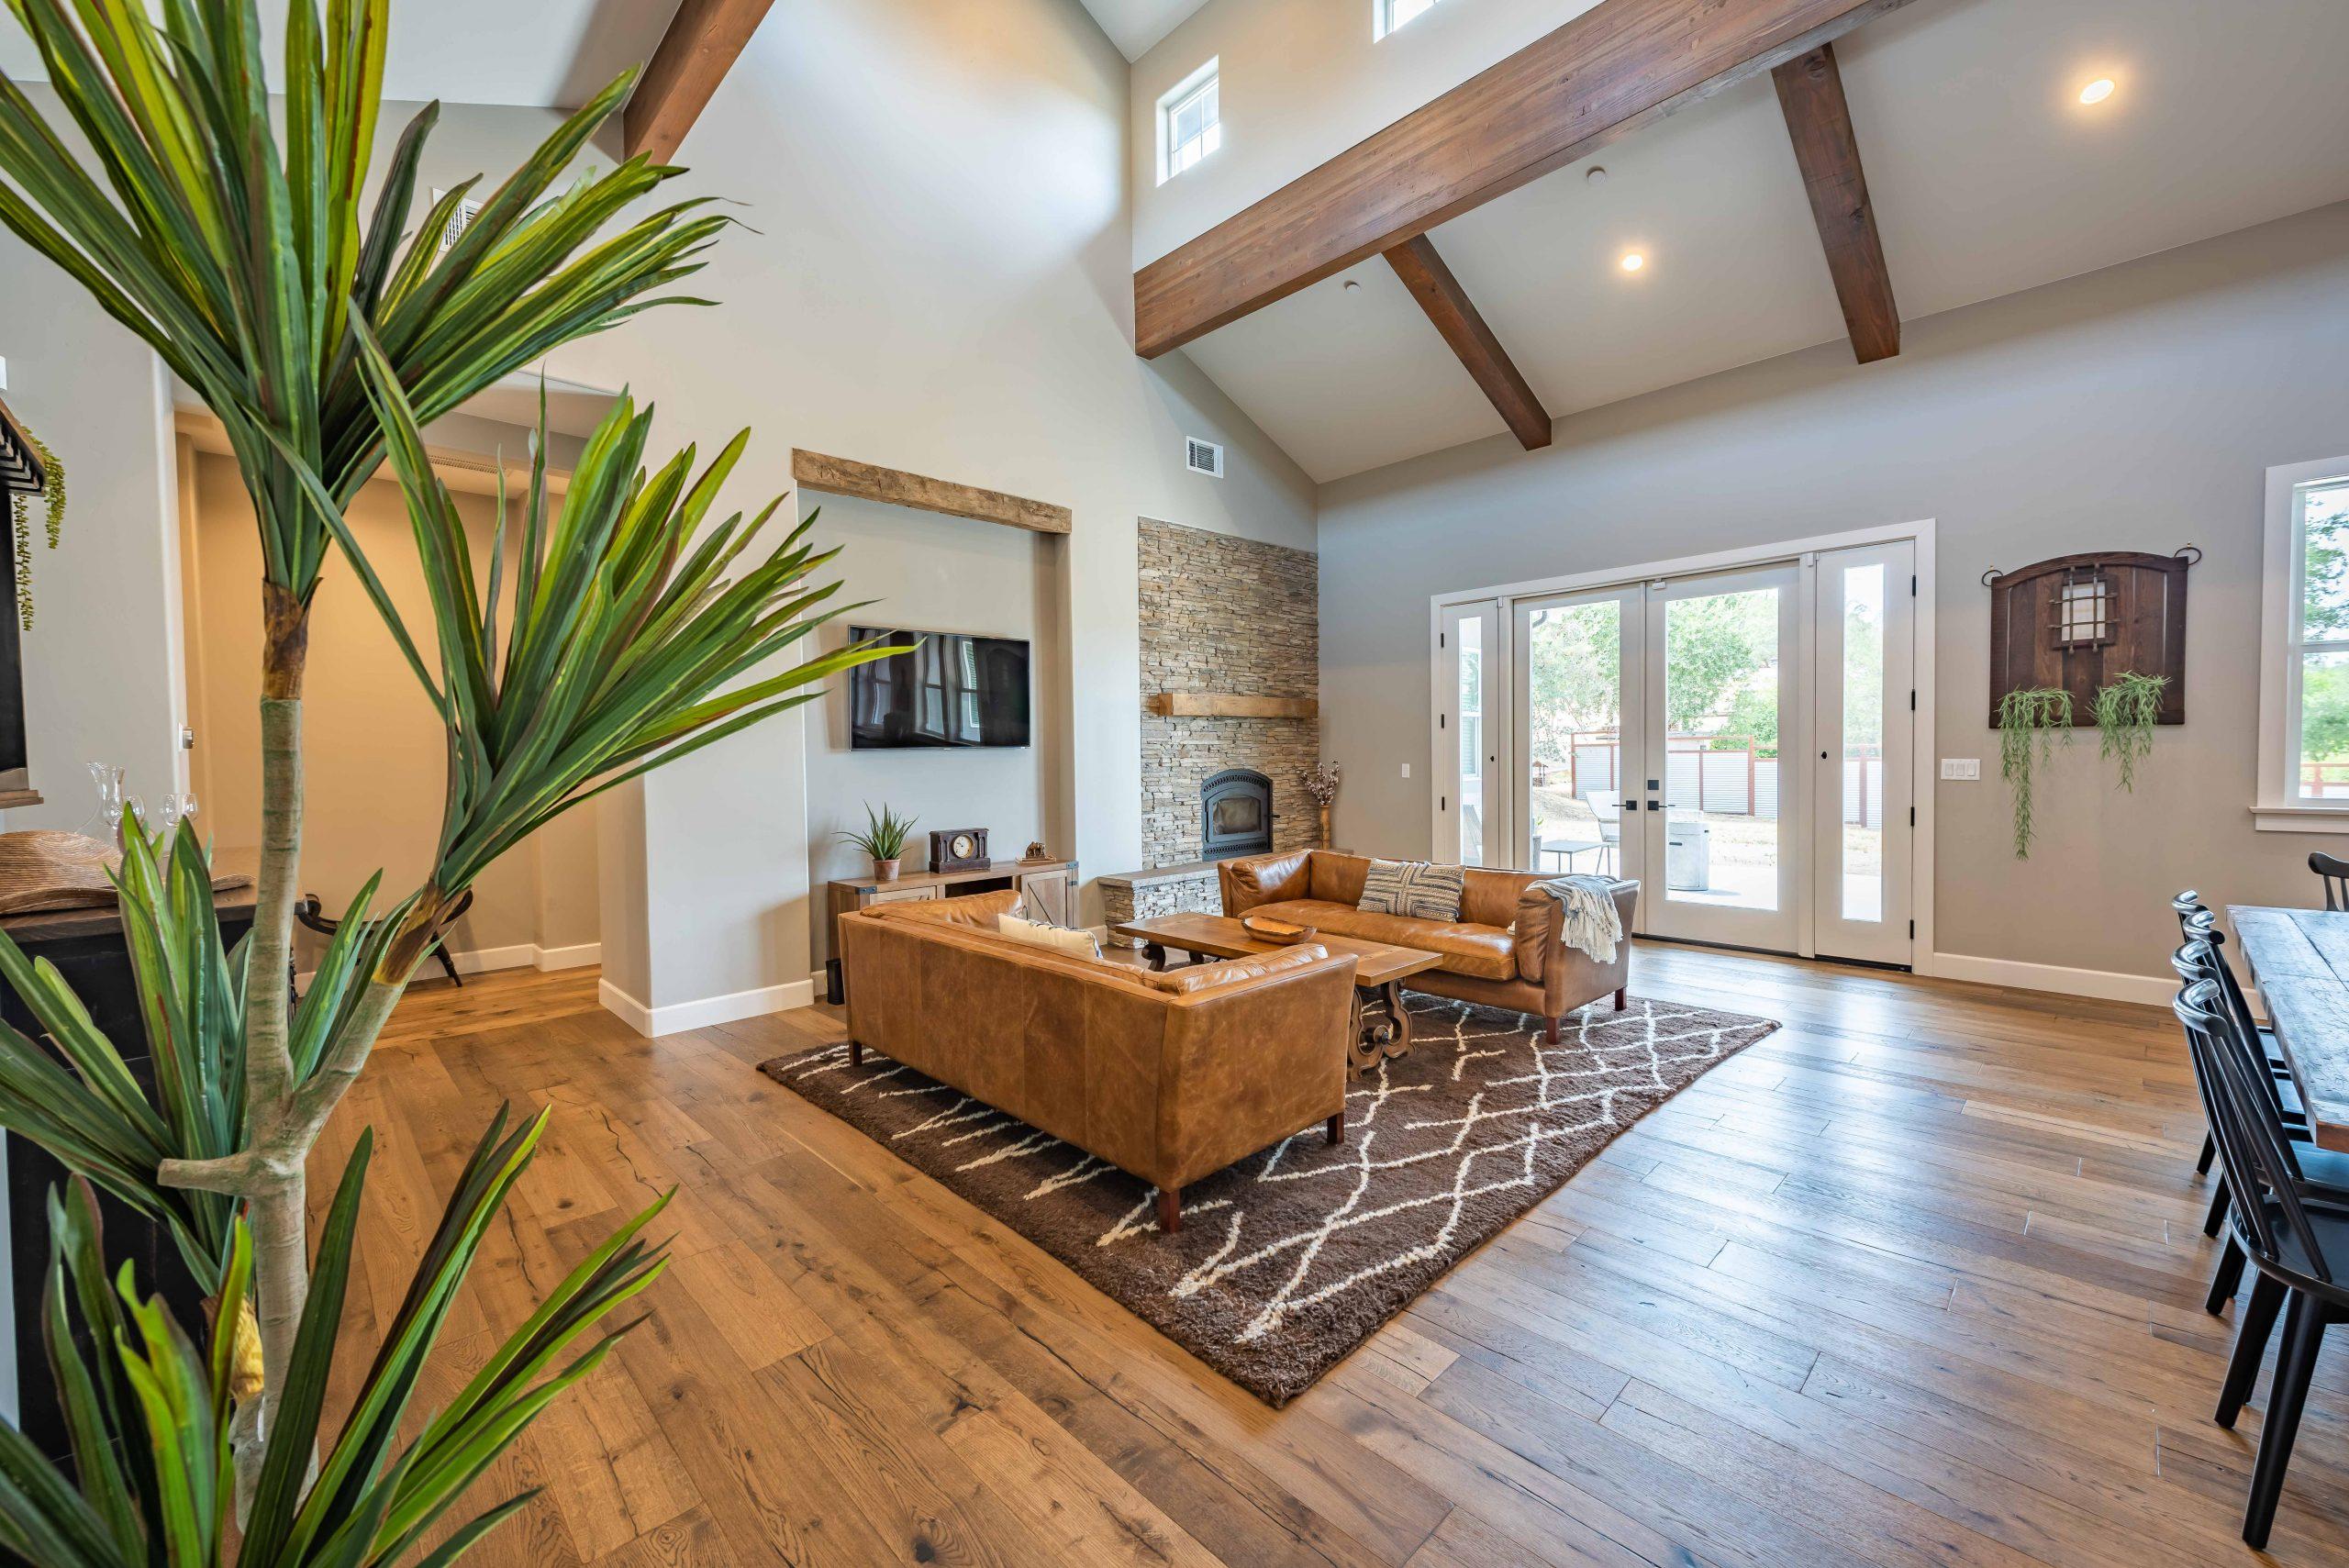 j's farmhouse living room